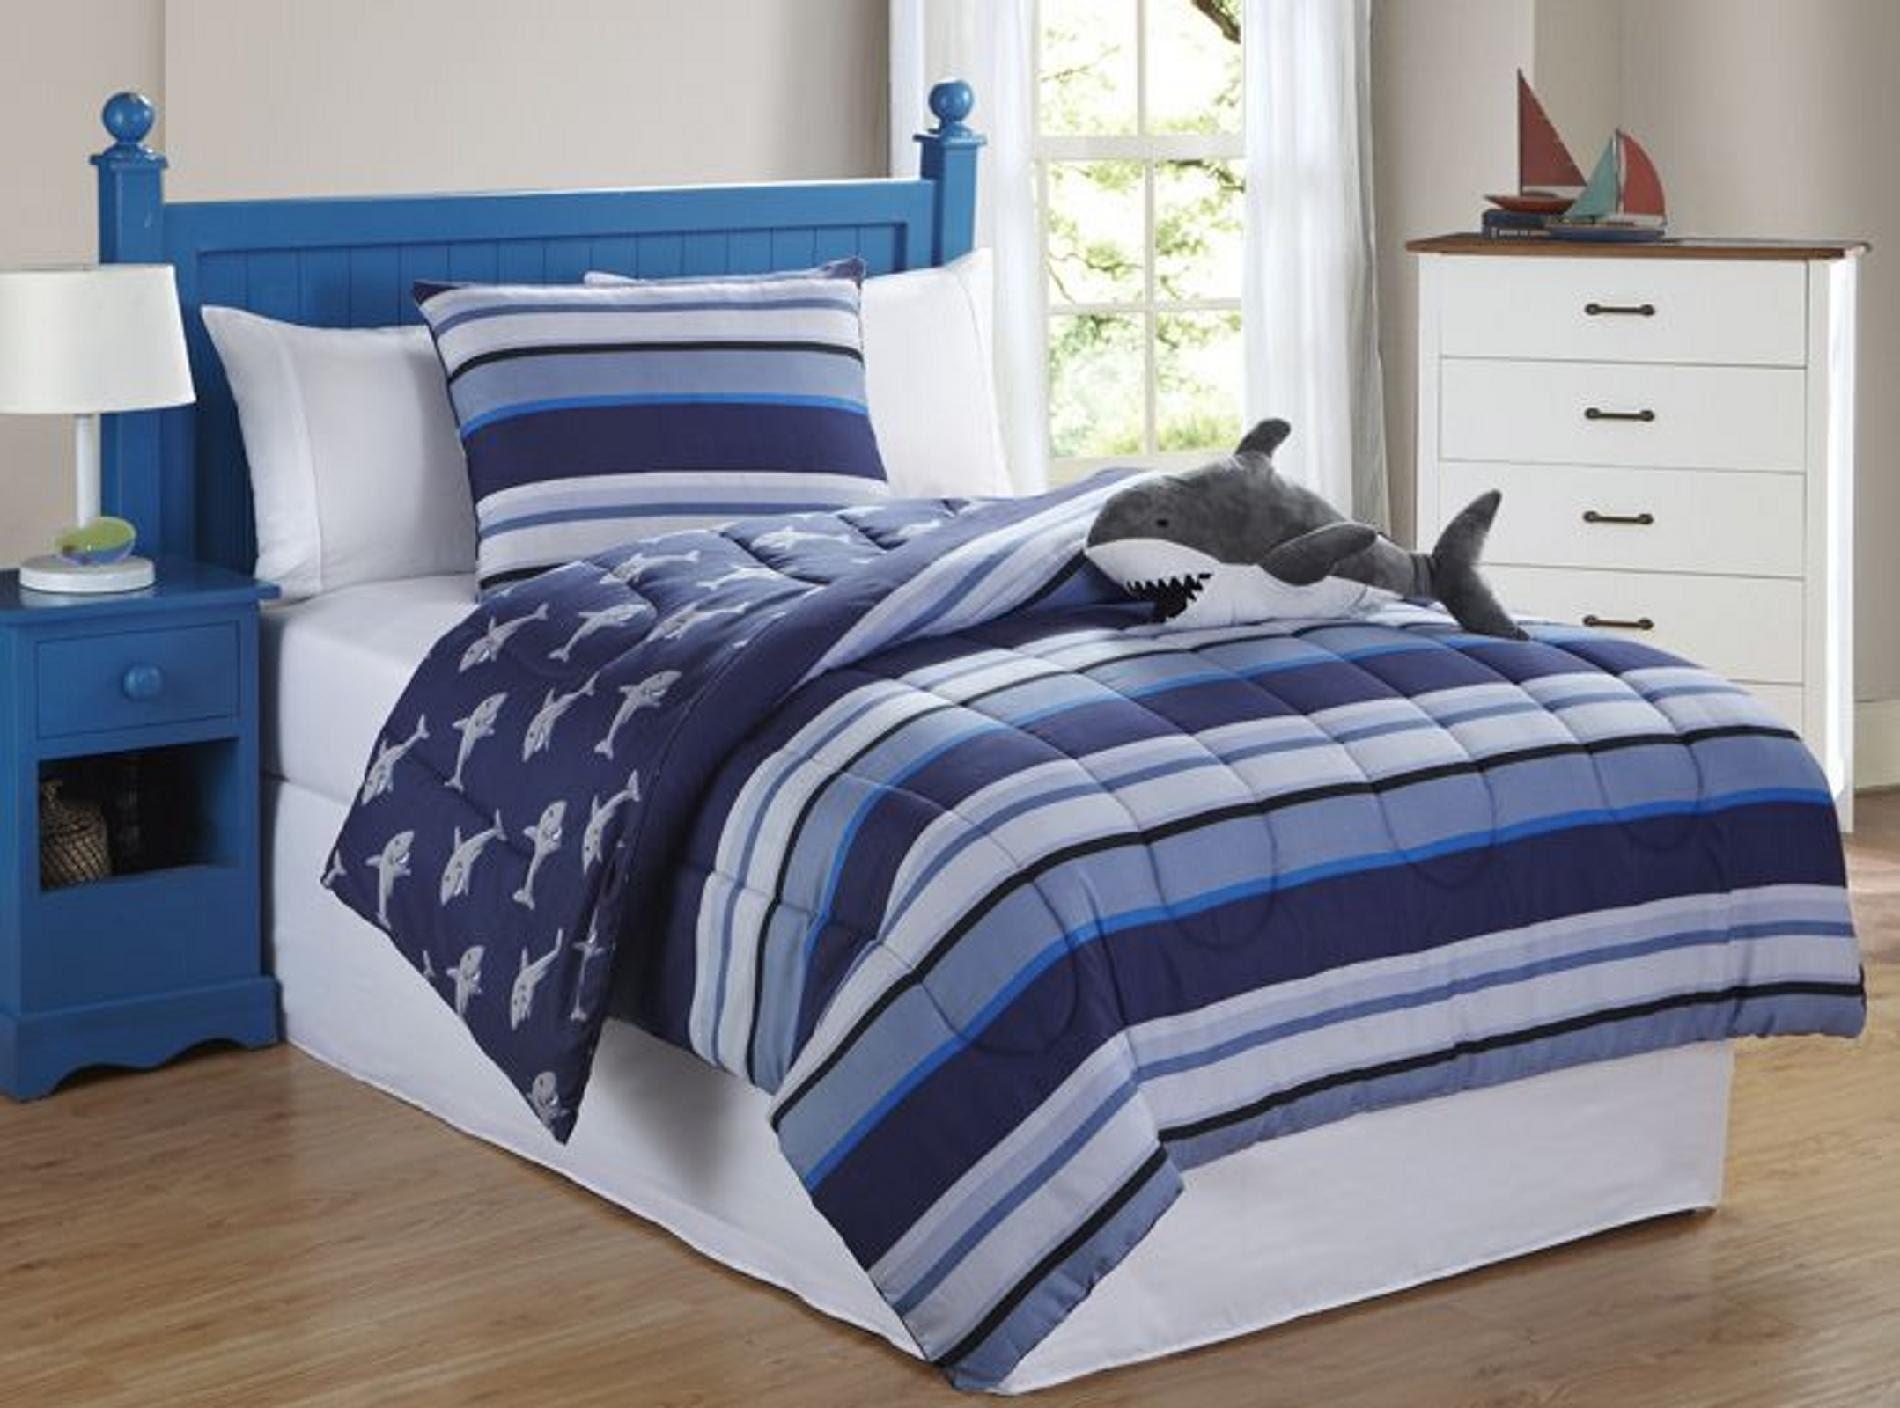 Furry Friends Shark Stripe 3 Piece Comforter Set - Home ...